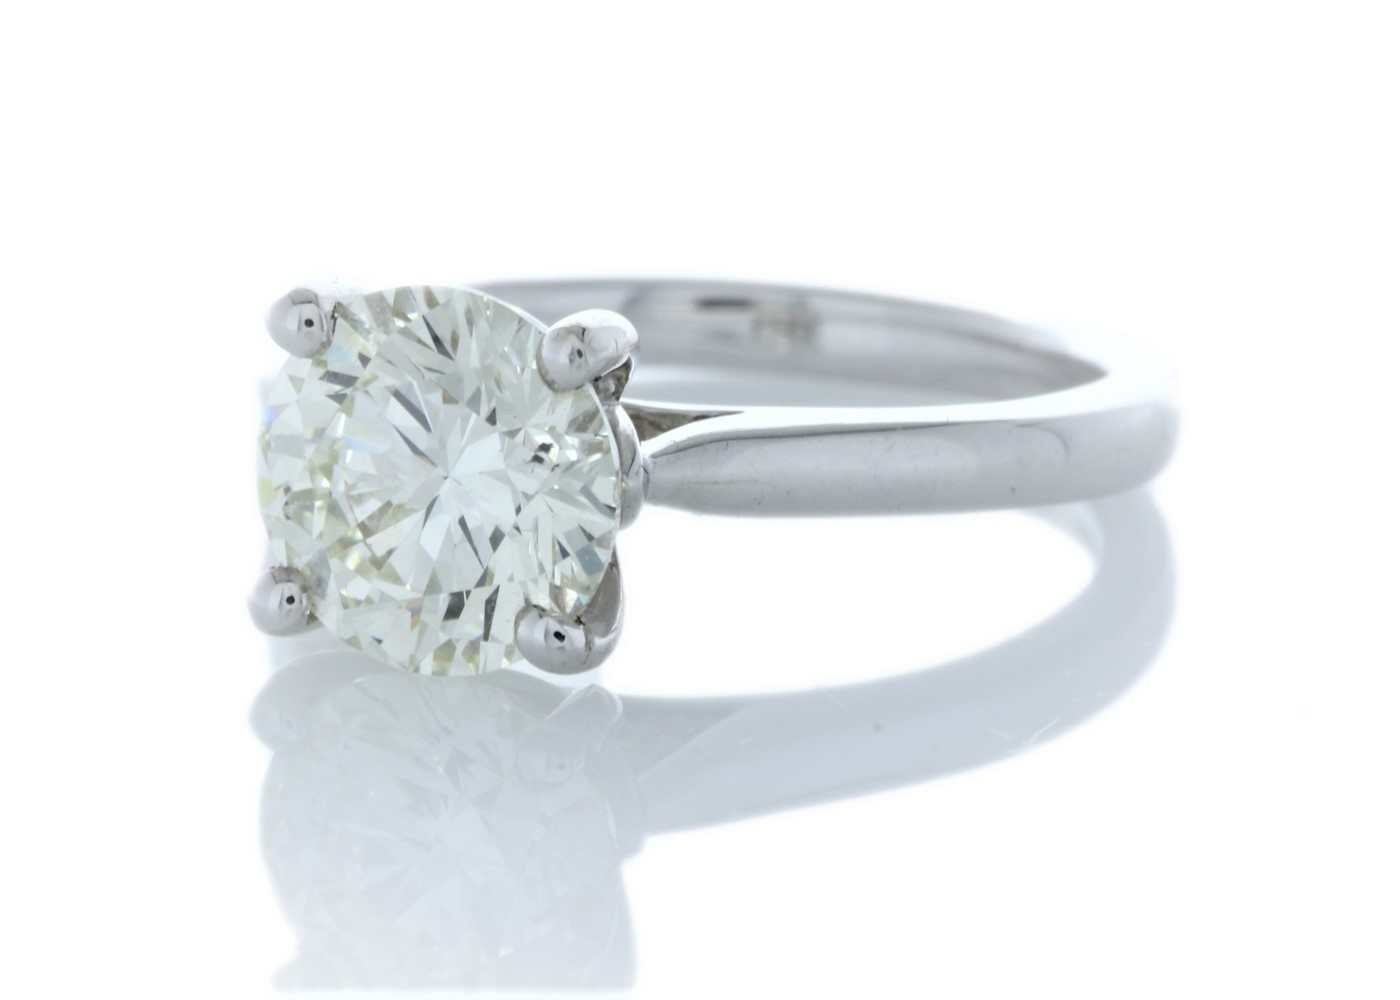 18ct White Gold Single Stone Claw Set Diamond Ring 2.05 Carats - Image 2 of 5